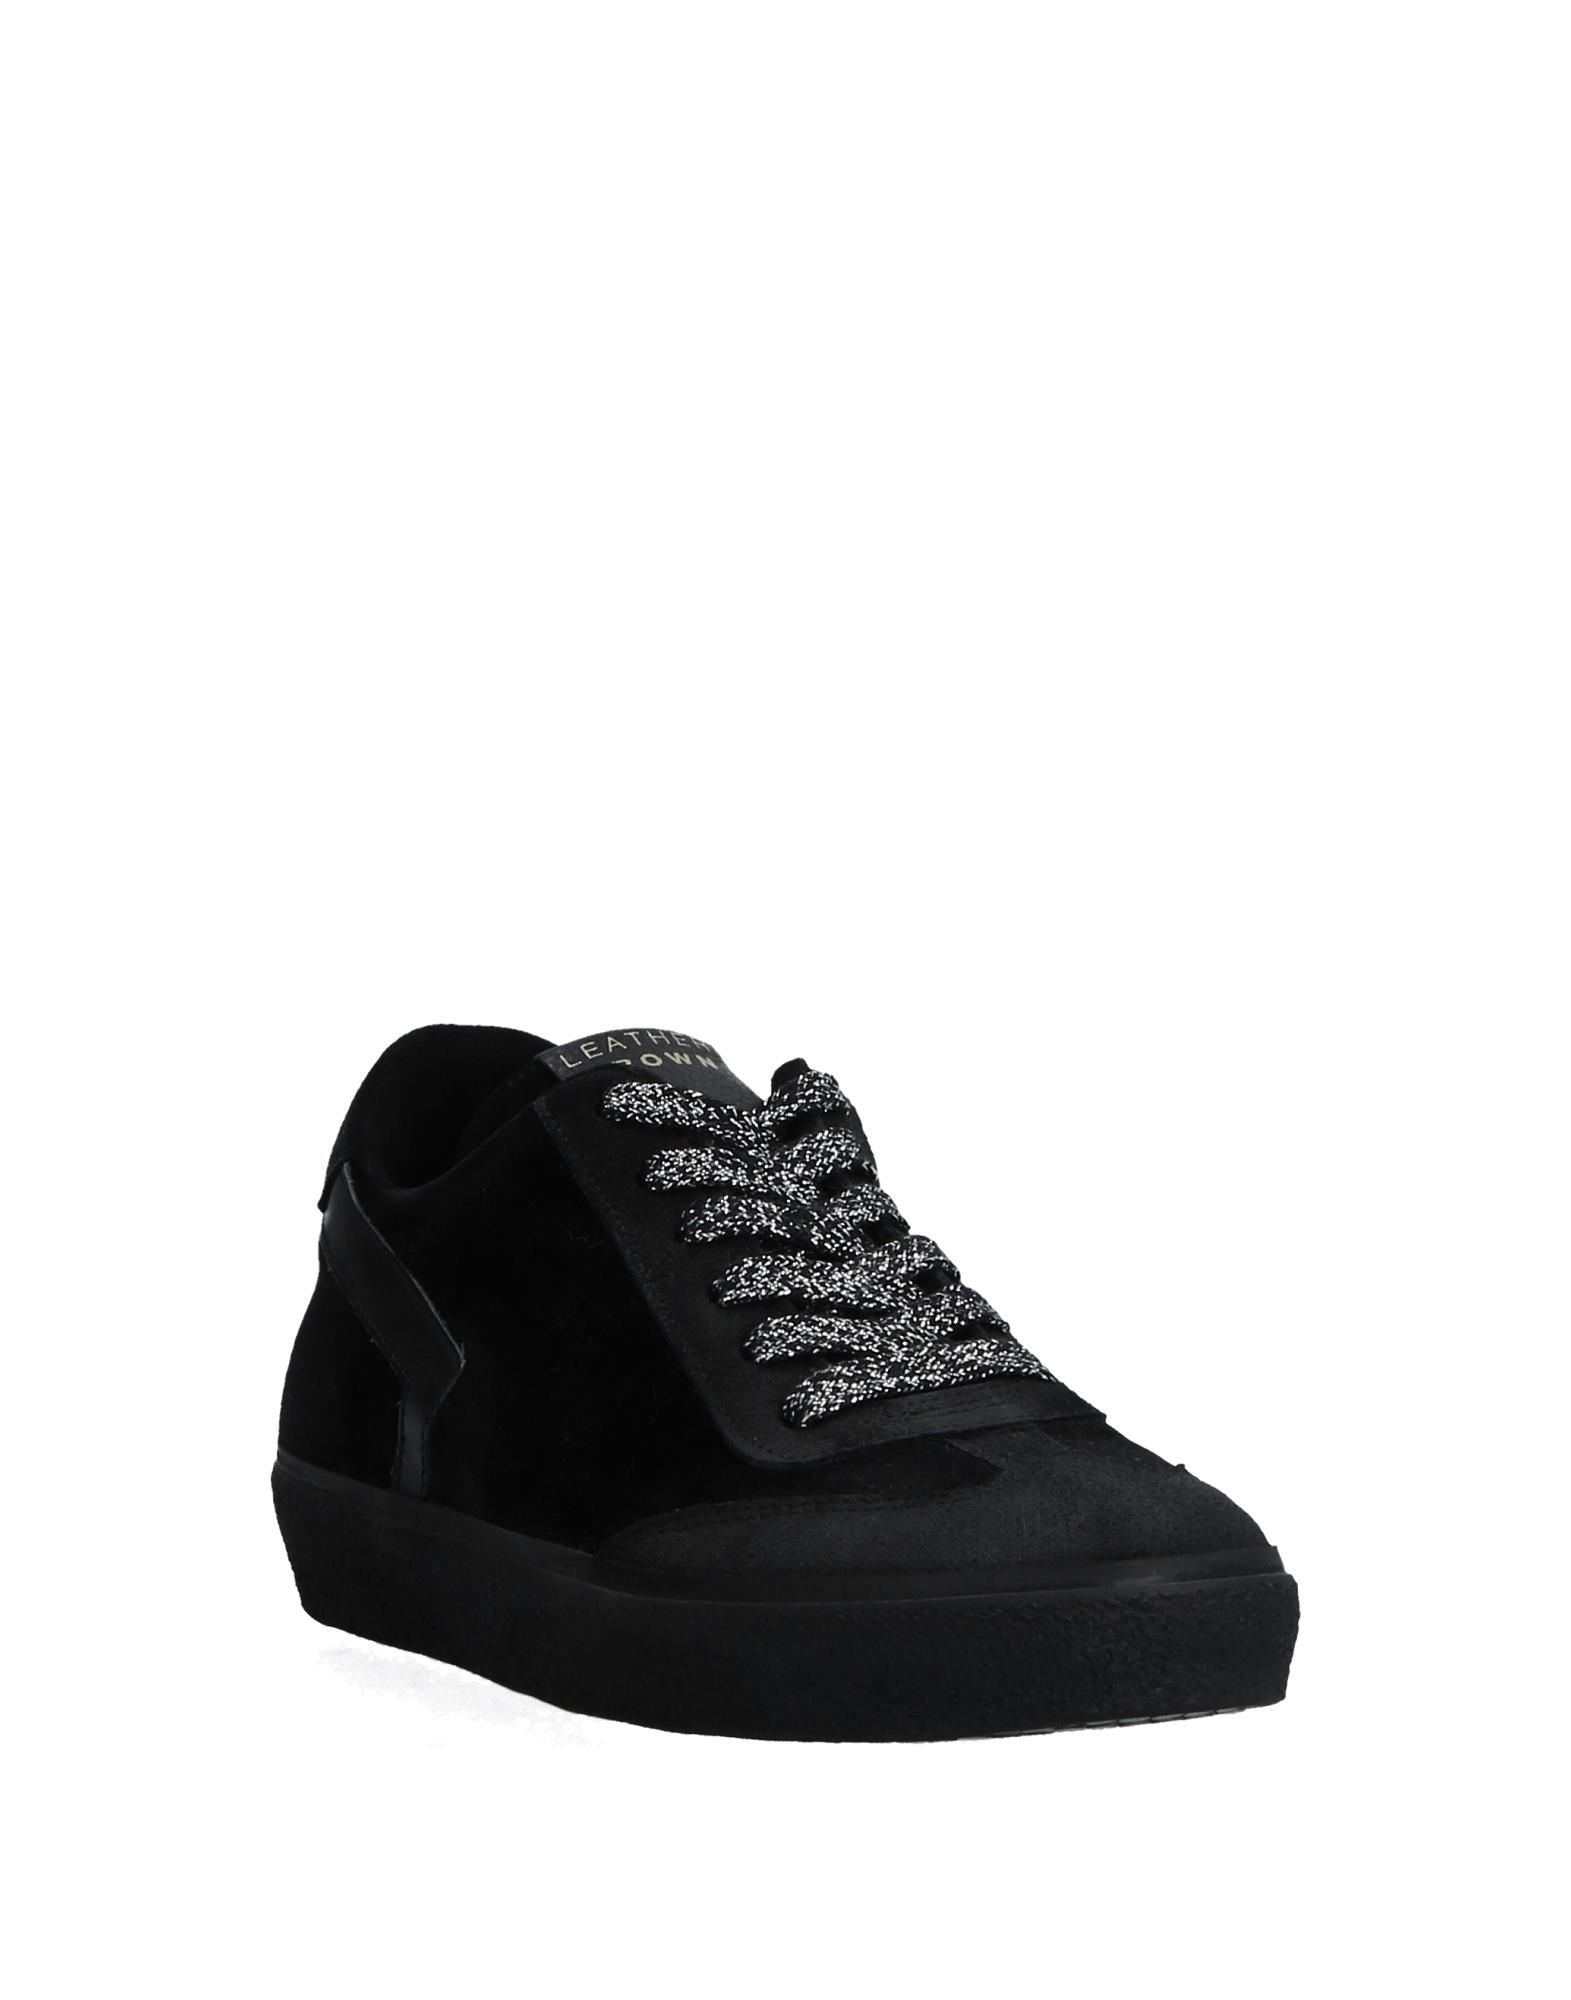 Stilvolle billige Schuhe Leather Crown Crown Crown Sneakers Damen  11531844KA 950d73